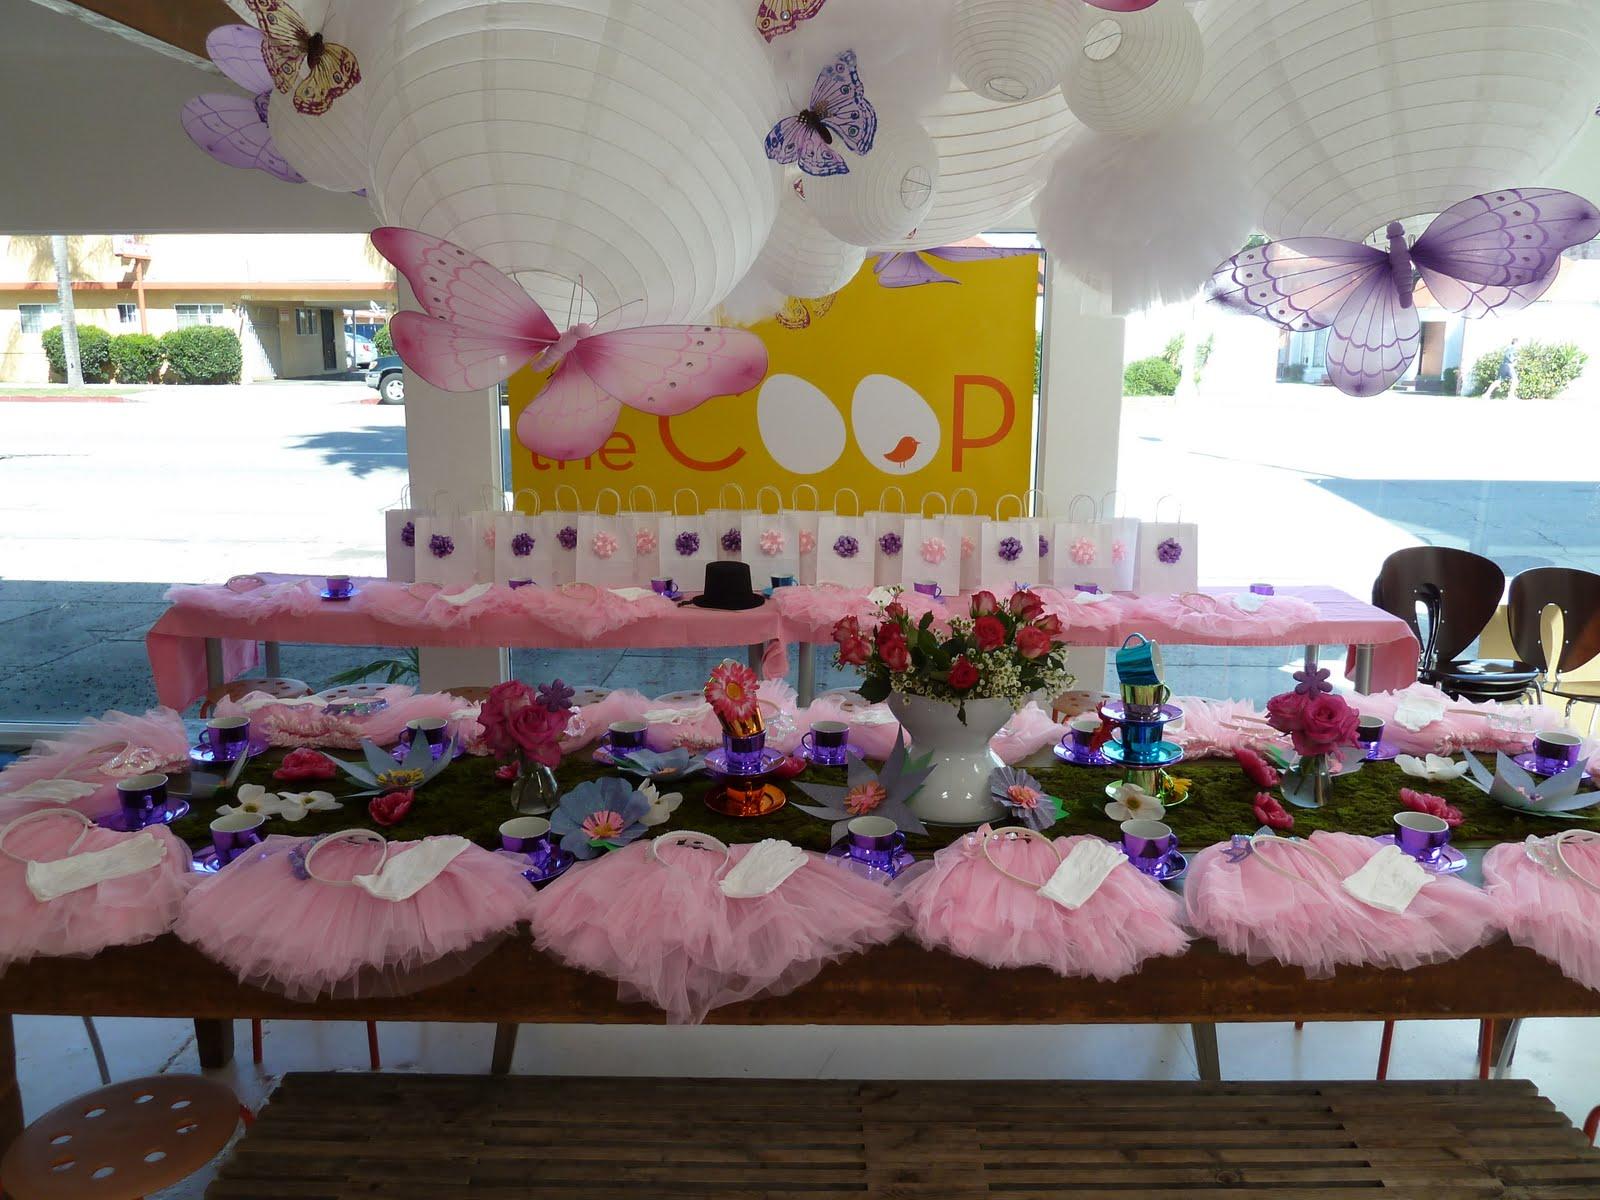 The Coop Princess Tea Party